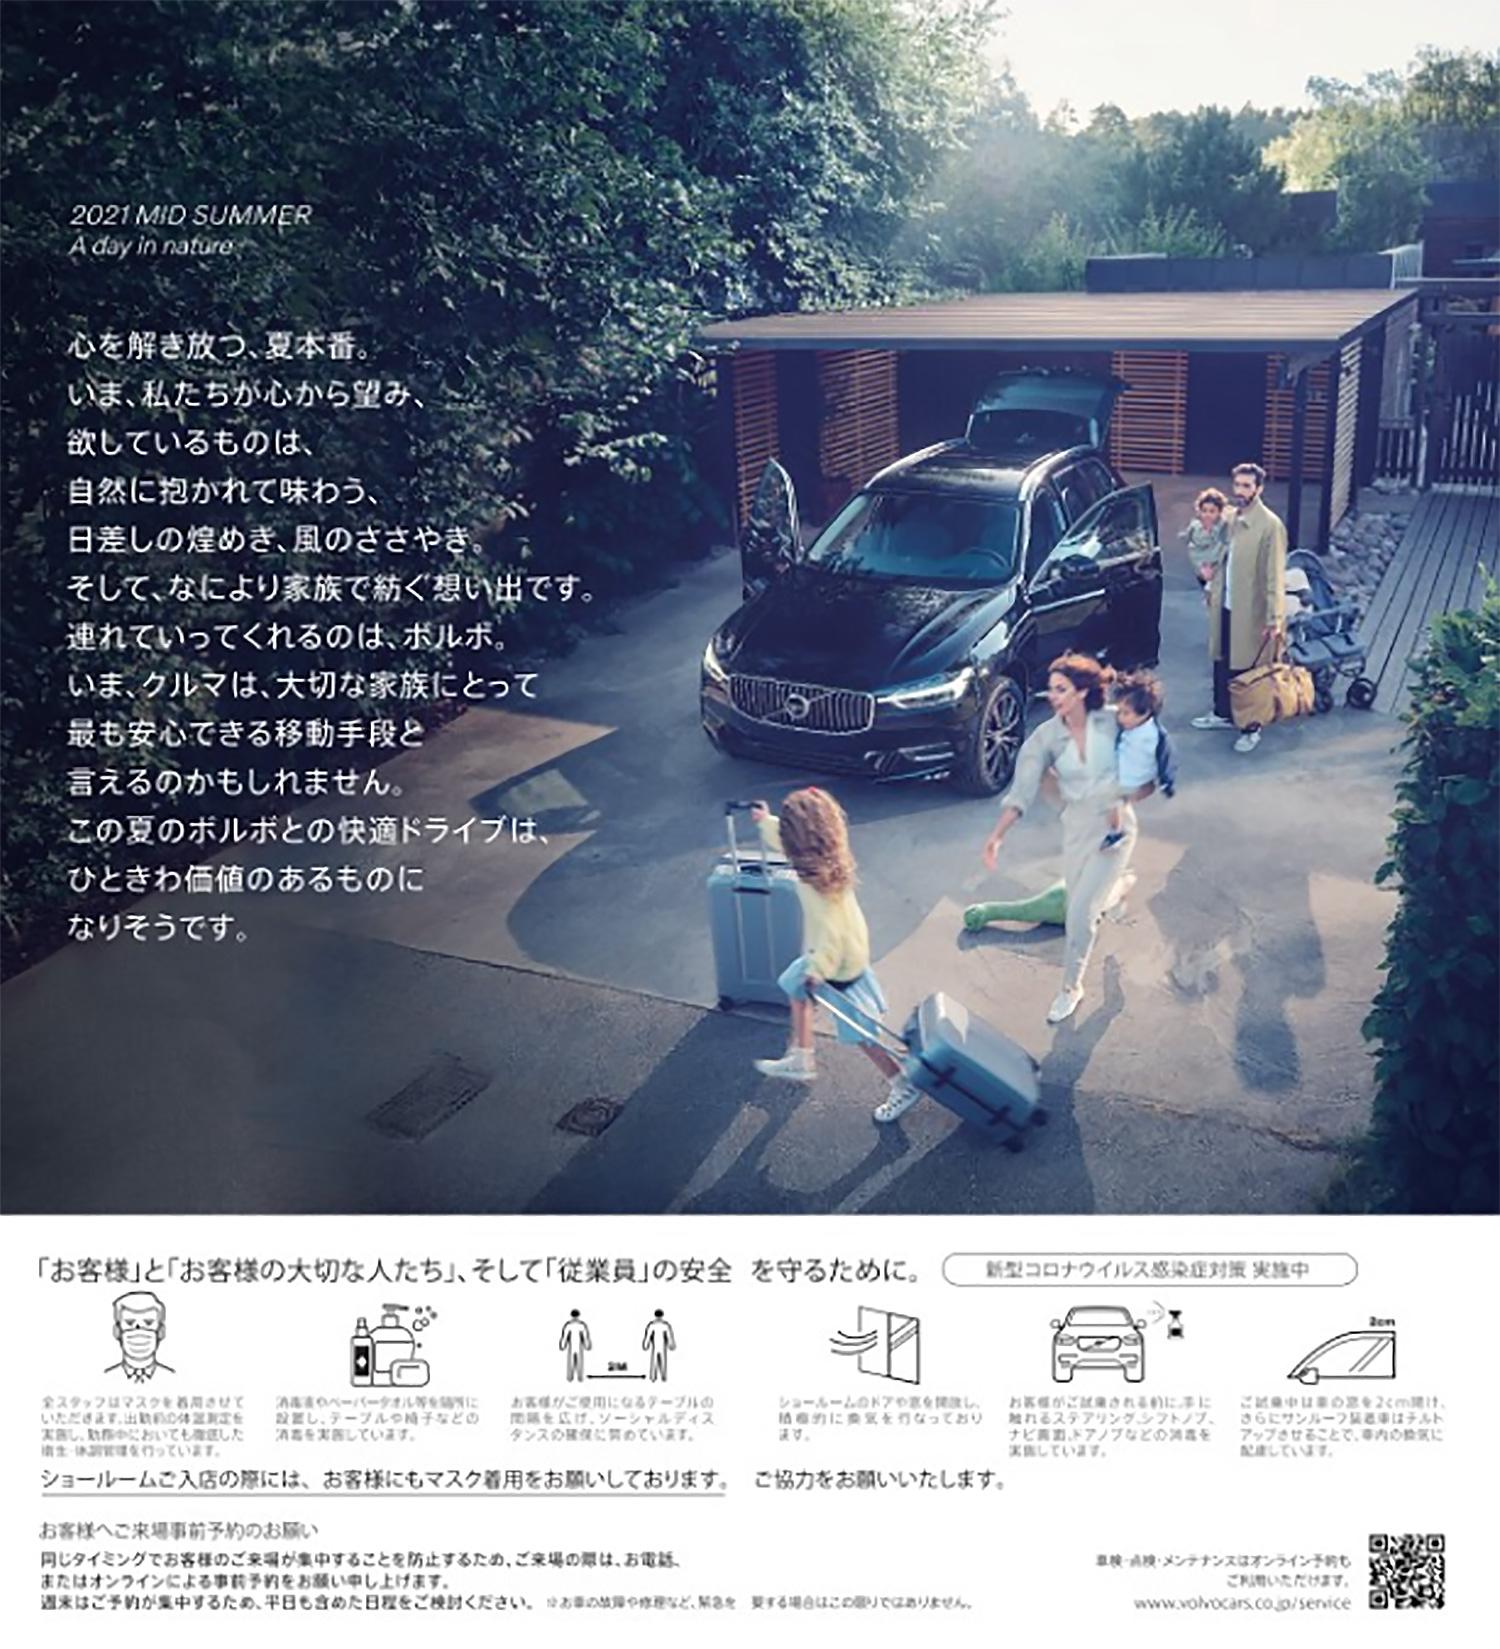 Volvo Mid Summer Campaign